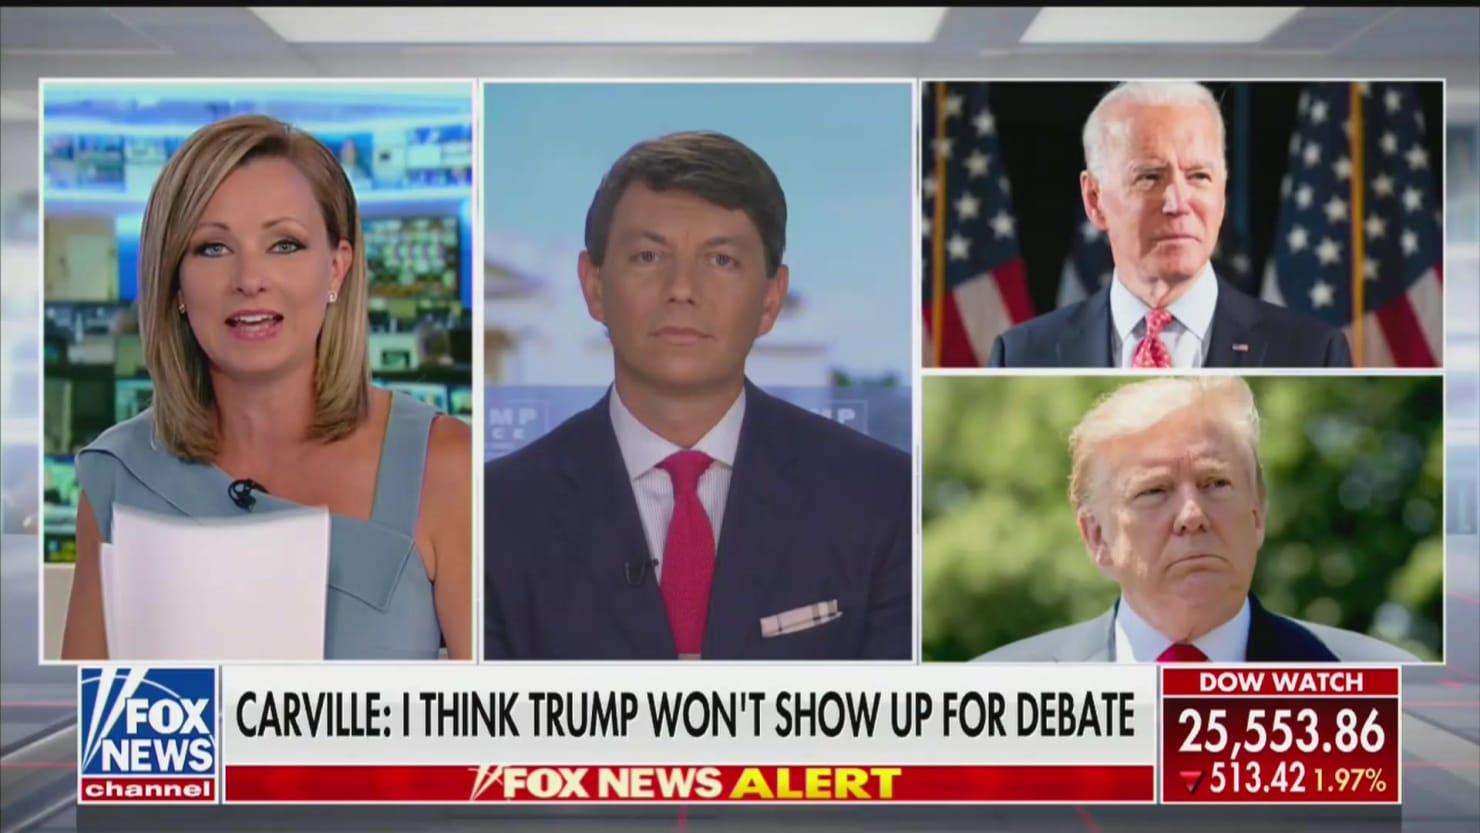 Fox News Anchor Sandra Smith Forced to Quickly Pivot When Trump Spox Goes on Bizarro Biden Rant